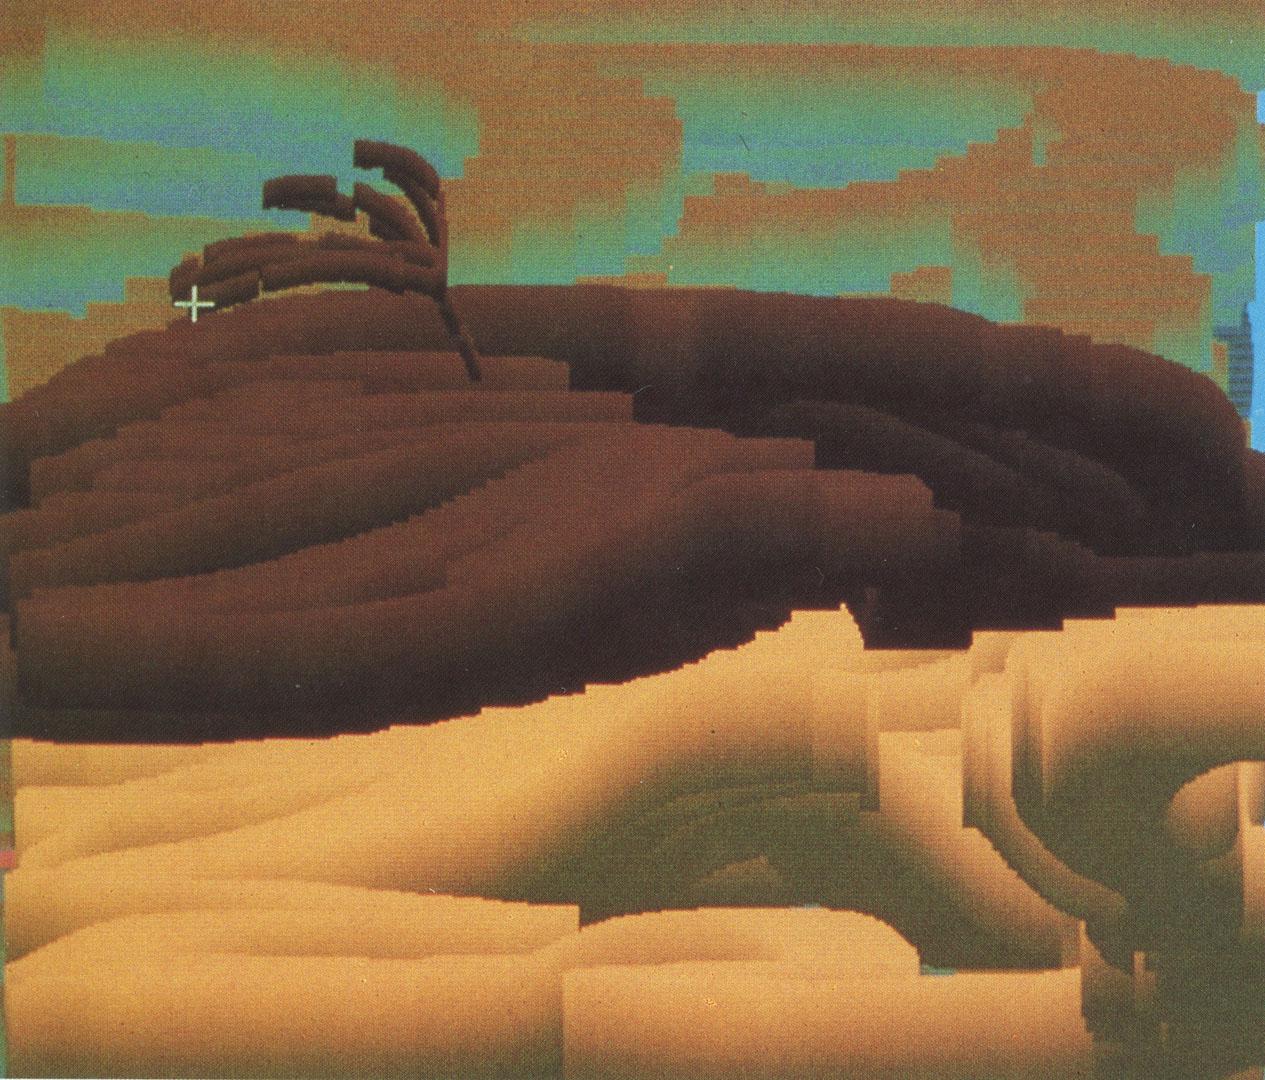 ©1983, Yuan-Lin Mao, Alfalfa